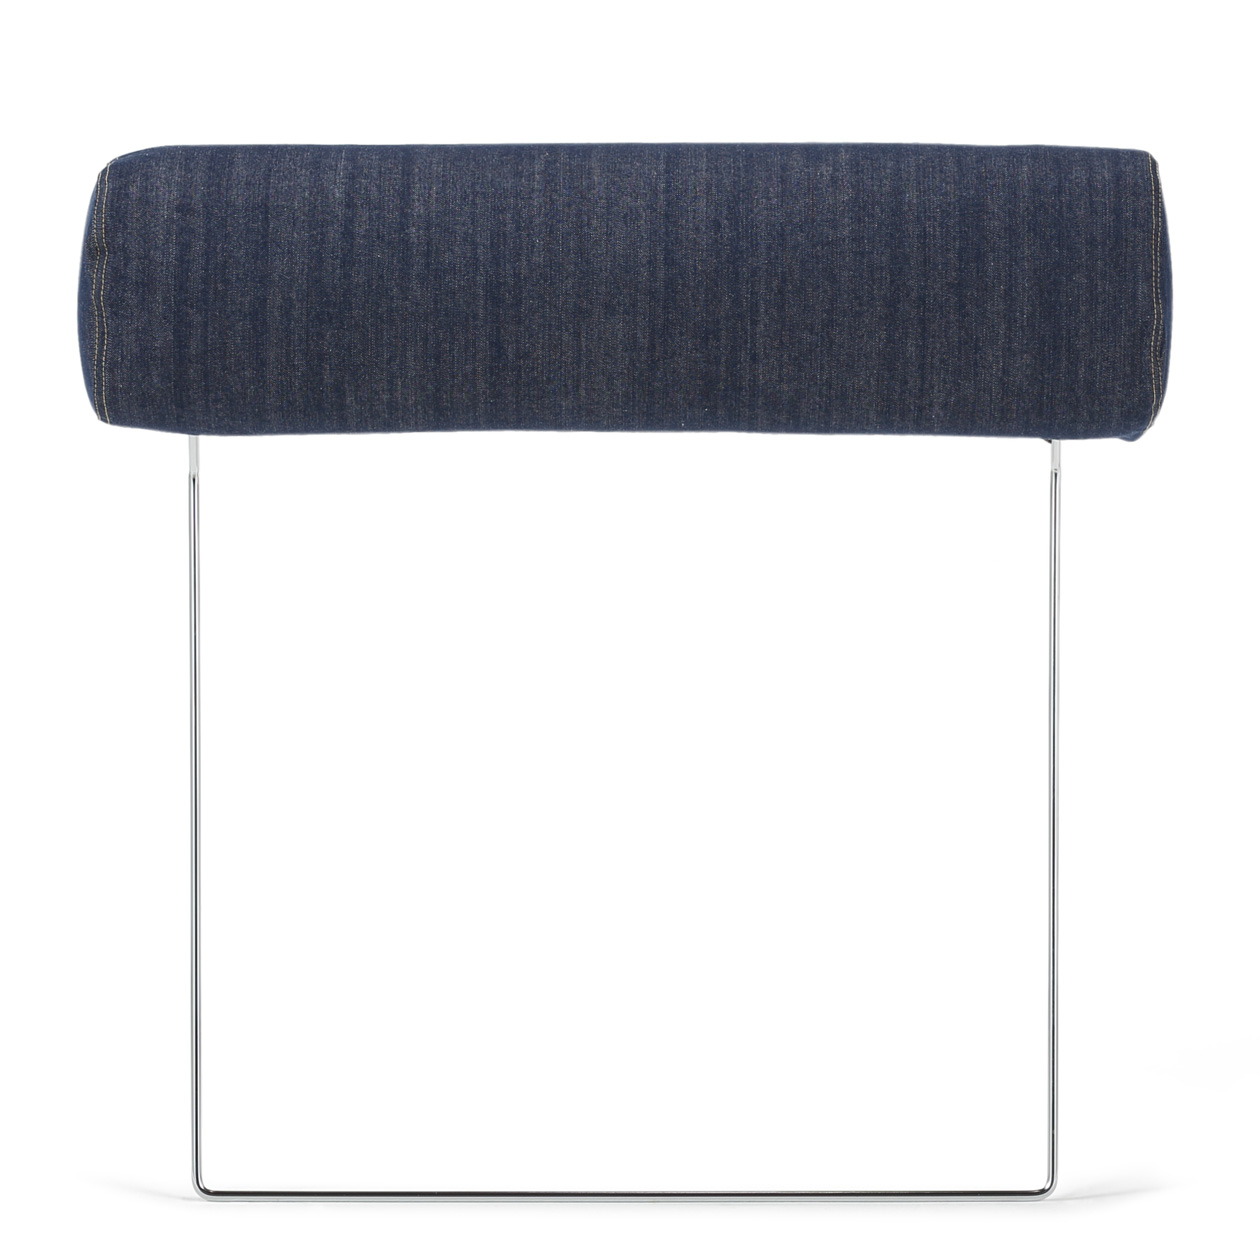 RoomClip商品情報 - 綿デニムソファ本体ヘッドレスト2.5シーター用カバー/ブルー 2.5シーター用/ブルー